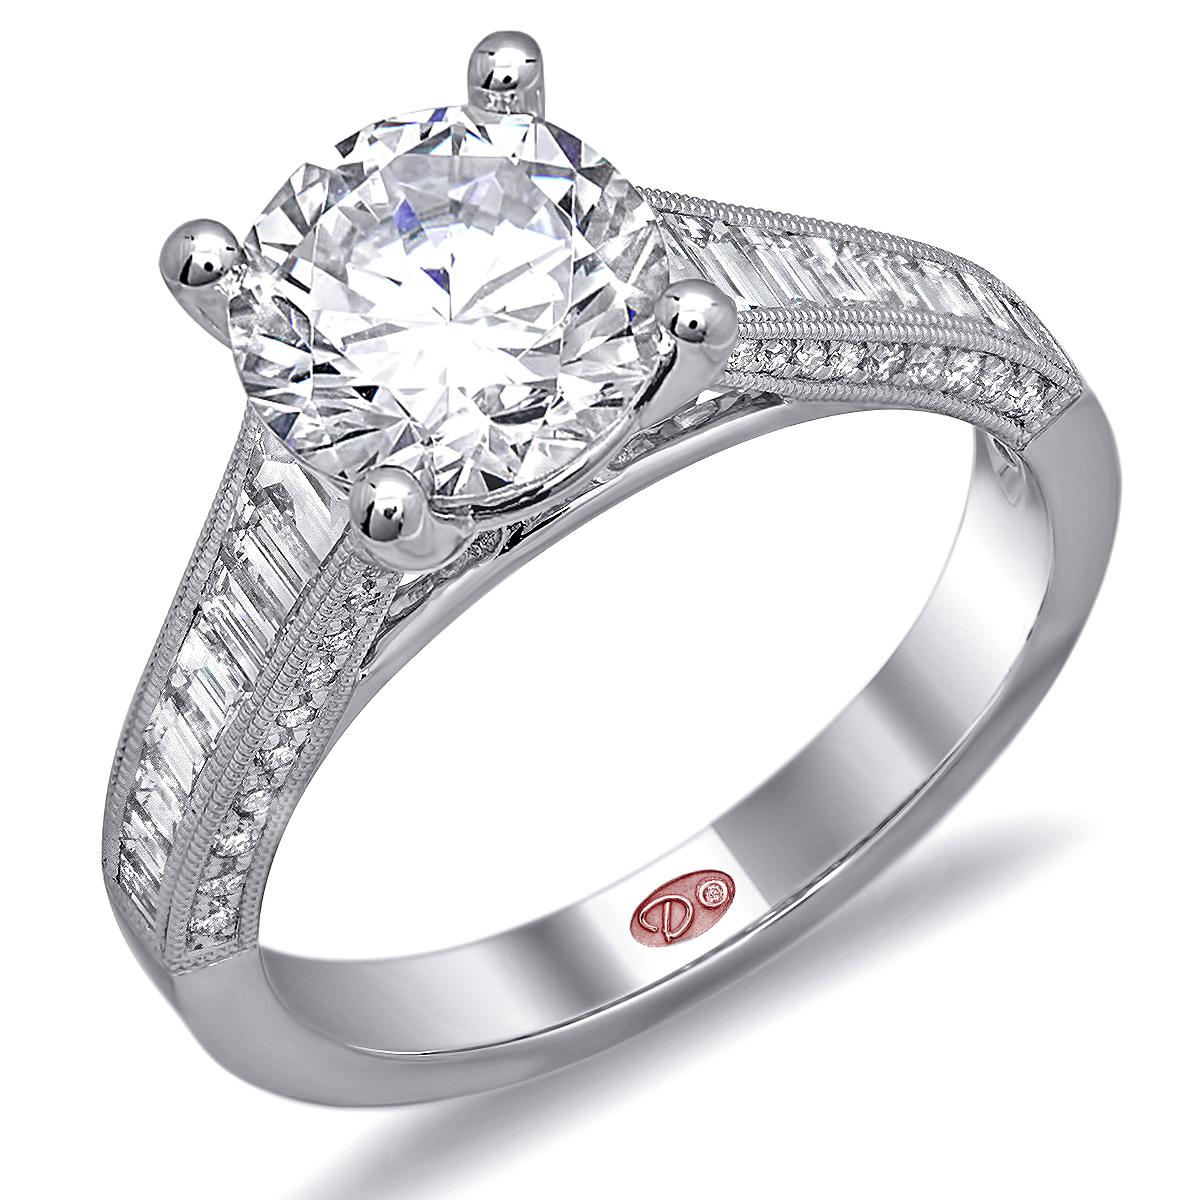 Bridal Ring Set Vidar Jewelry Unique Custom Engagement Wedding Diamond Rings Women Sets Ringolog -  Channel Set Bridal Engagement Rings Demarco Jewelry Official Wedding Ring Sets Bride Groom